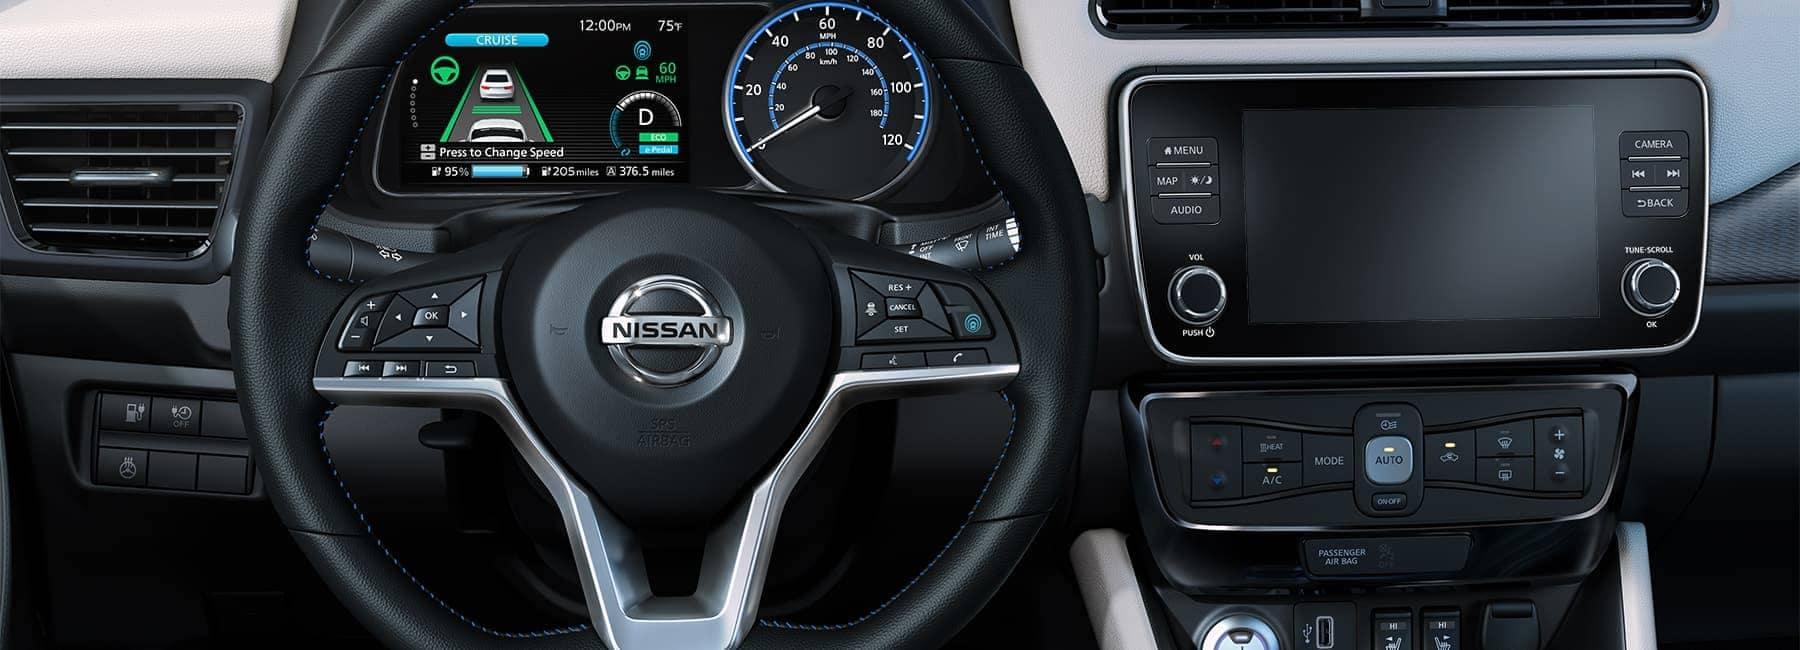 2020-nissan-leaf-interior-steering-wheel